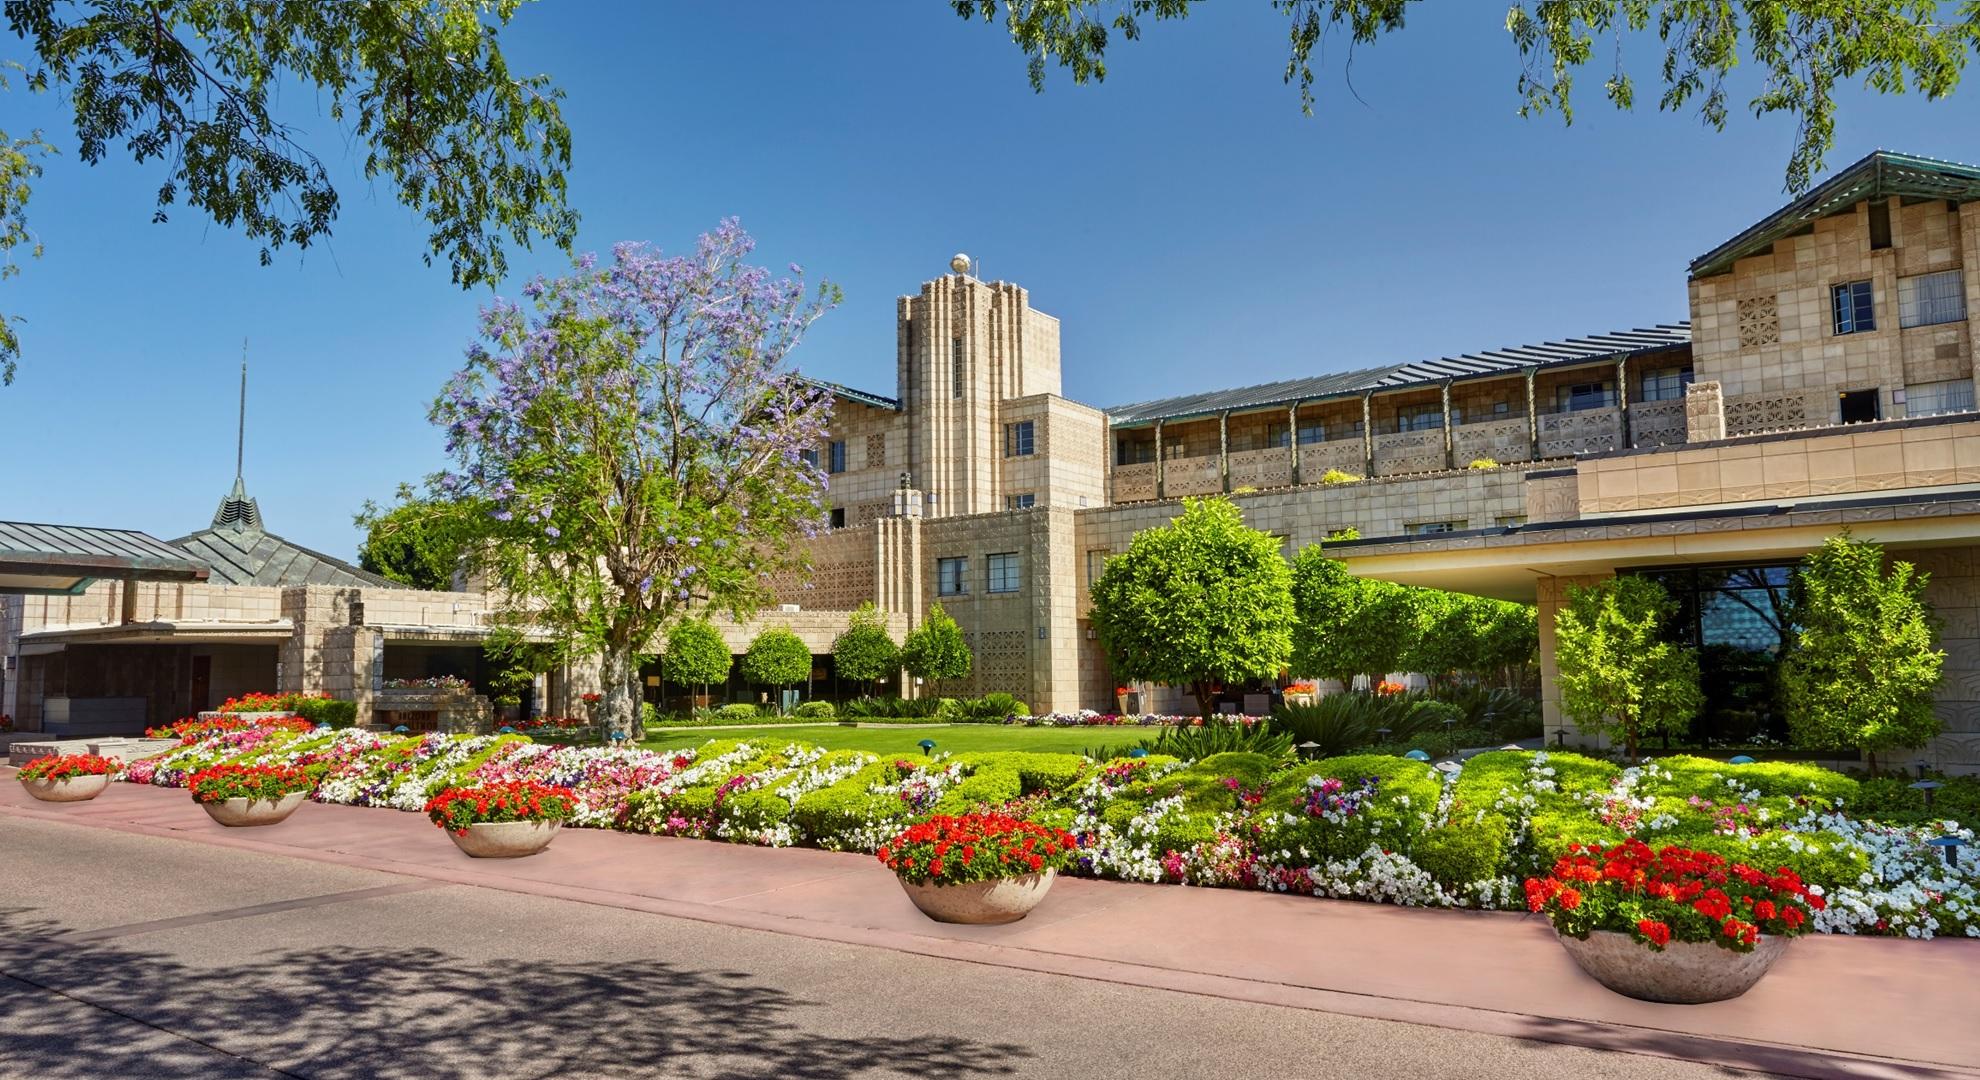 Arizona Biltmore Appoints Ryan Fitzgerald Resort